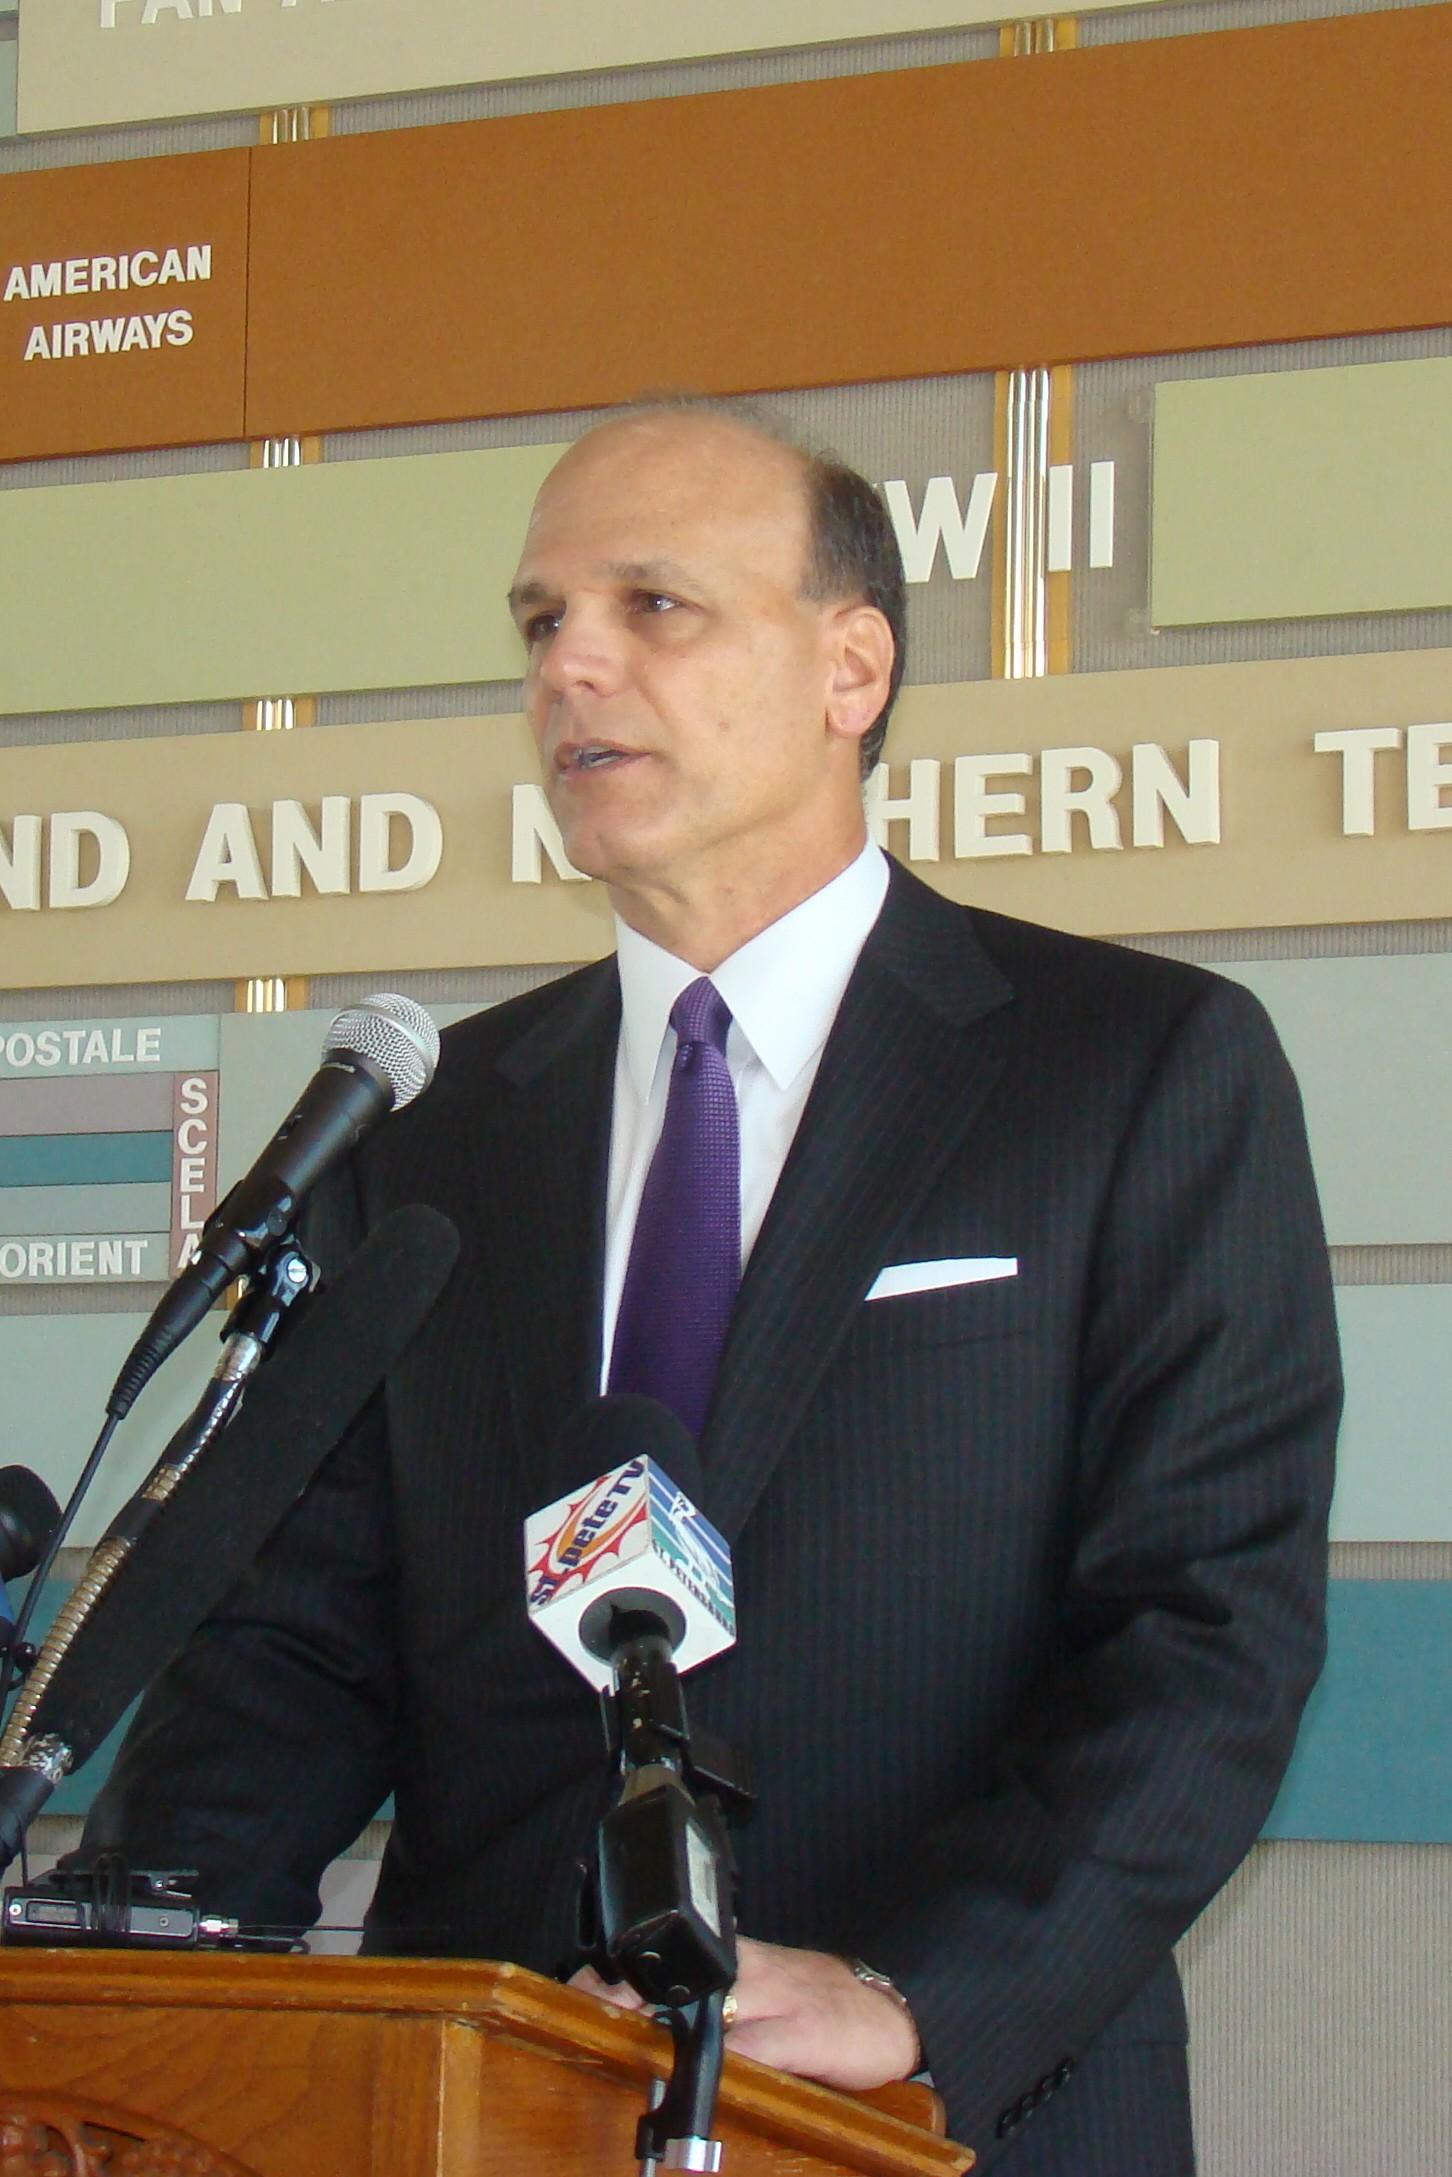 Gary Spulak, President of Embraer Aircraft Holding-2, 14 Mar '12.JPG